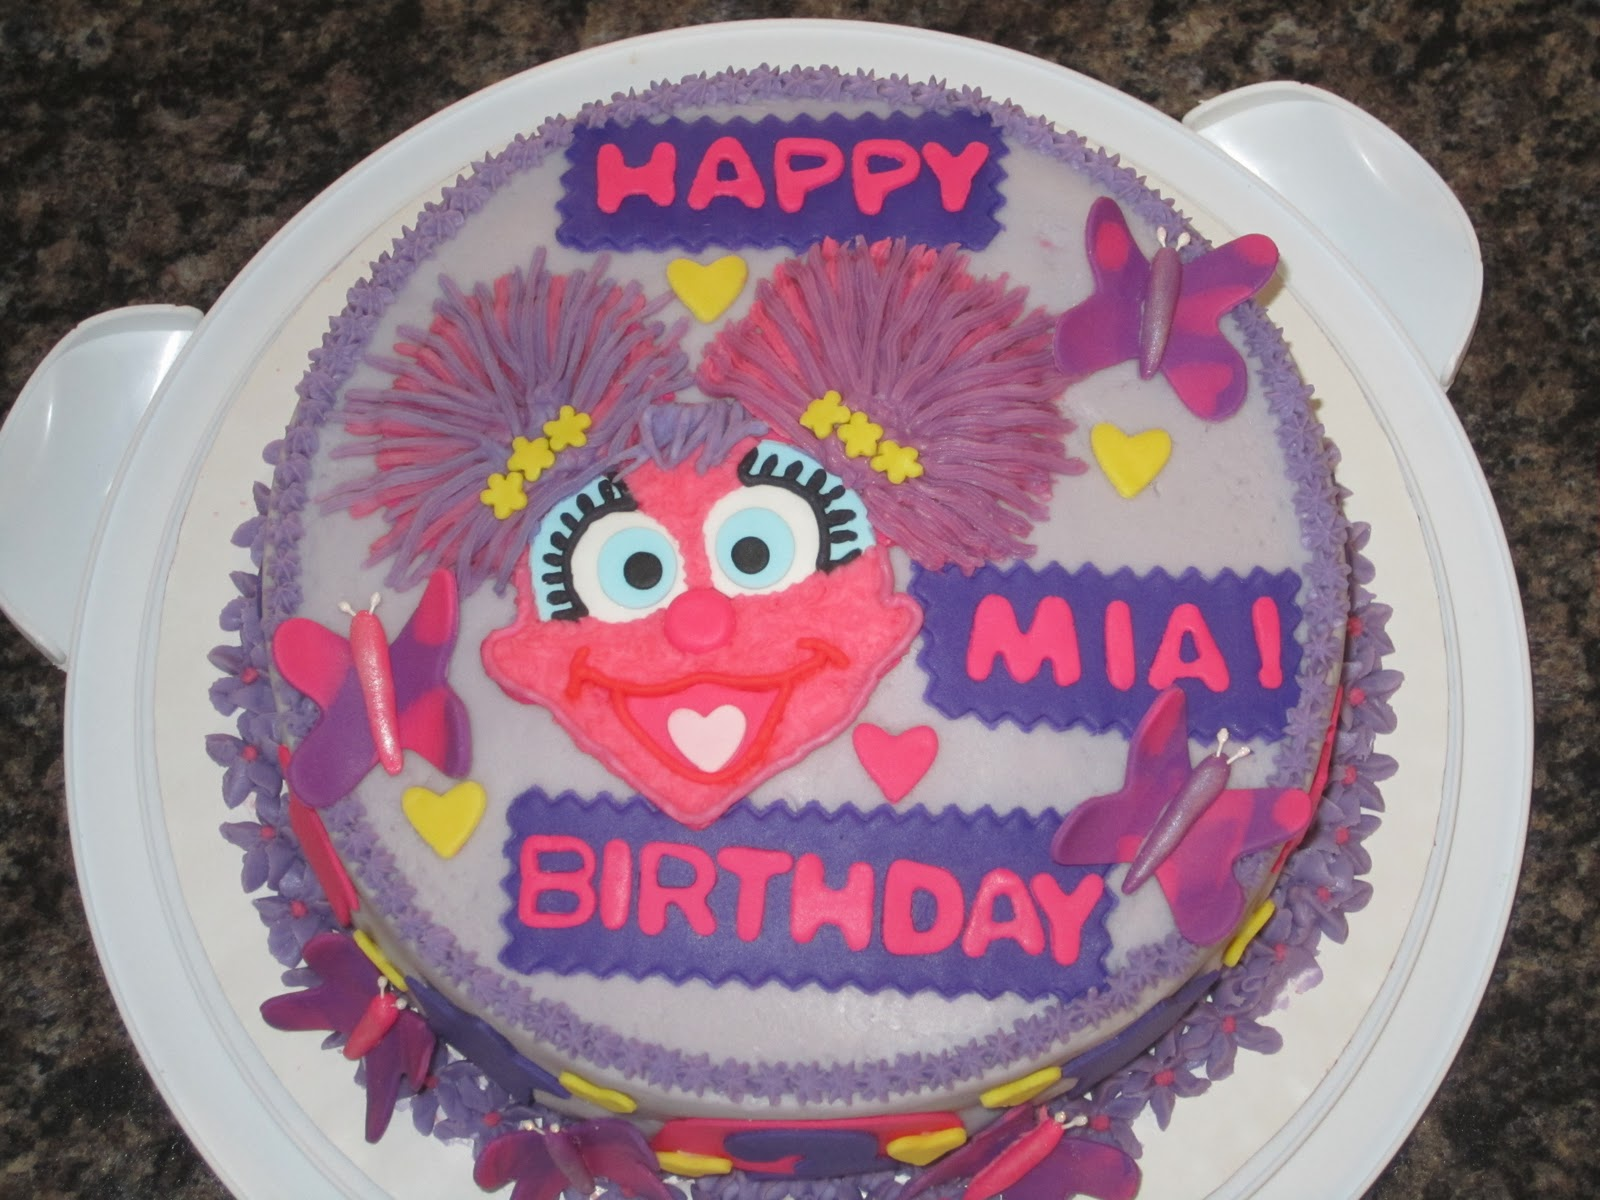 Swell My Cake Blog Abby Cadabby Birthday Cake Personalised Birthday Cards Veneteletsinfo